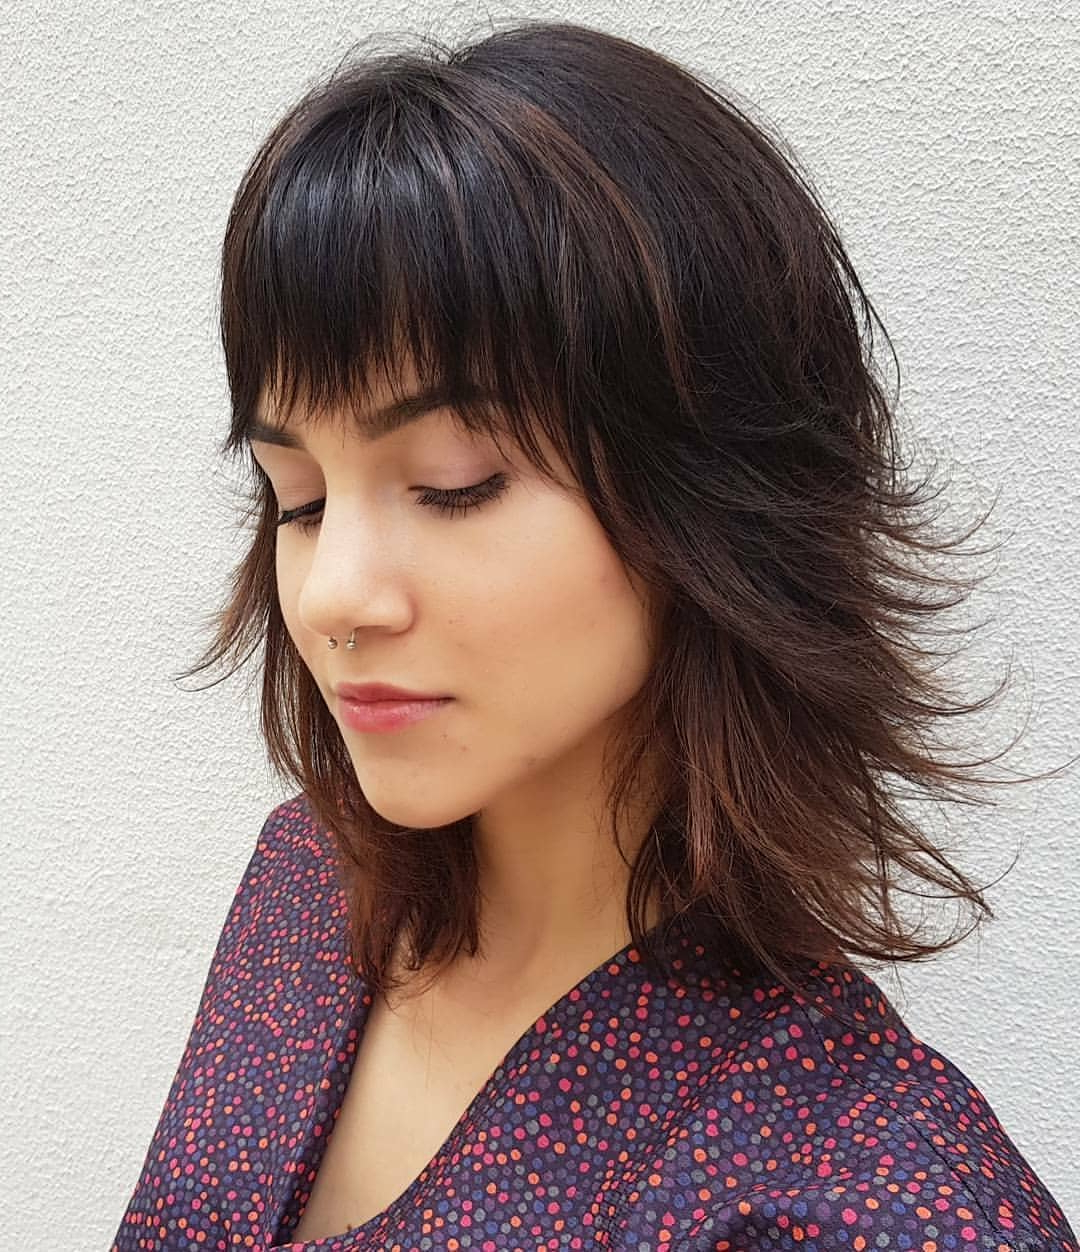 Preferred Medium Choppy Haircuts For Fine Hair Throughout 10 Trendy Choppy Lob Haircuts For Women, Best Medium Hair Styles 2019 (Gallery 8 of 20)